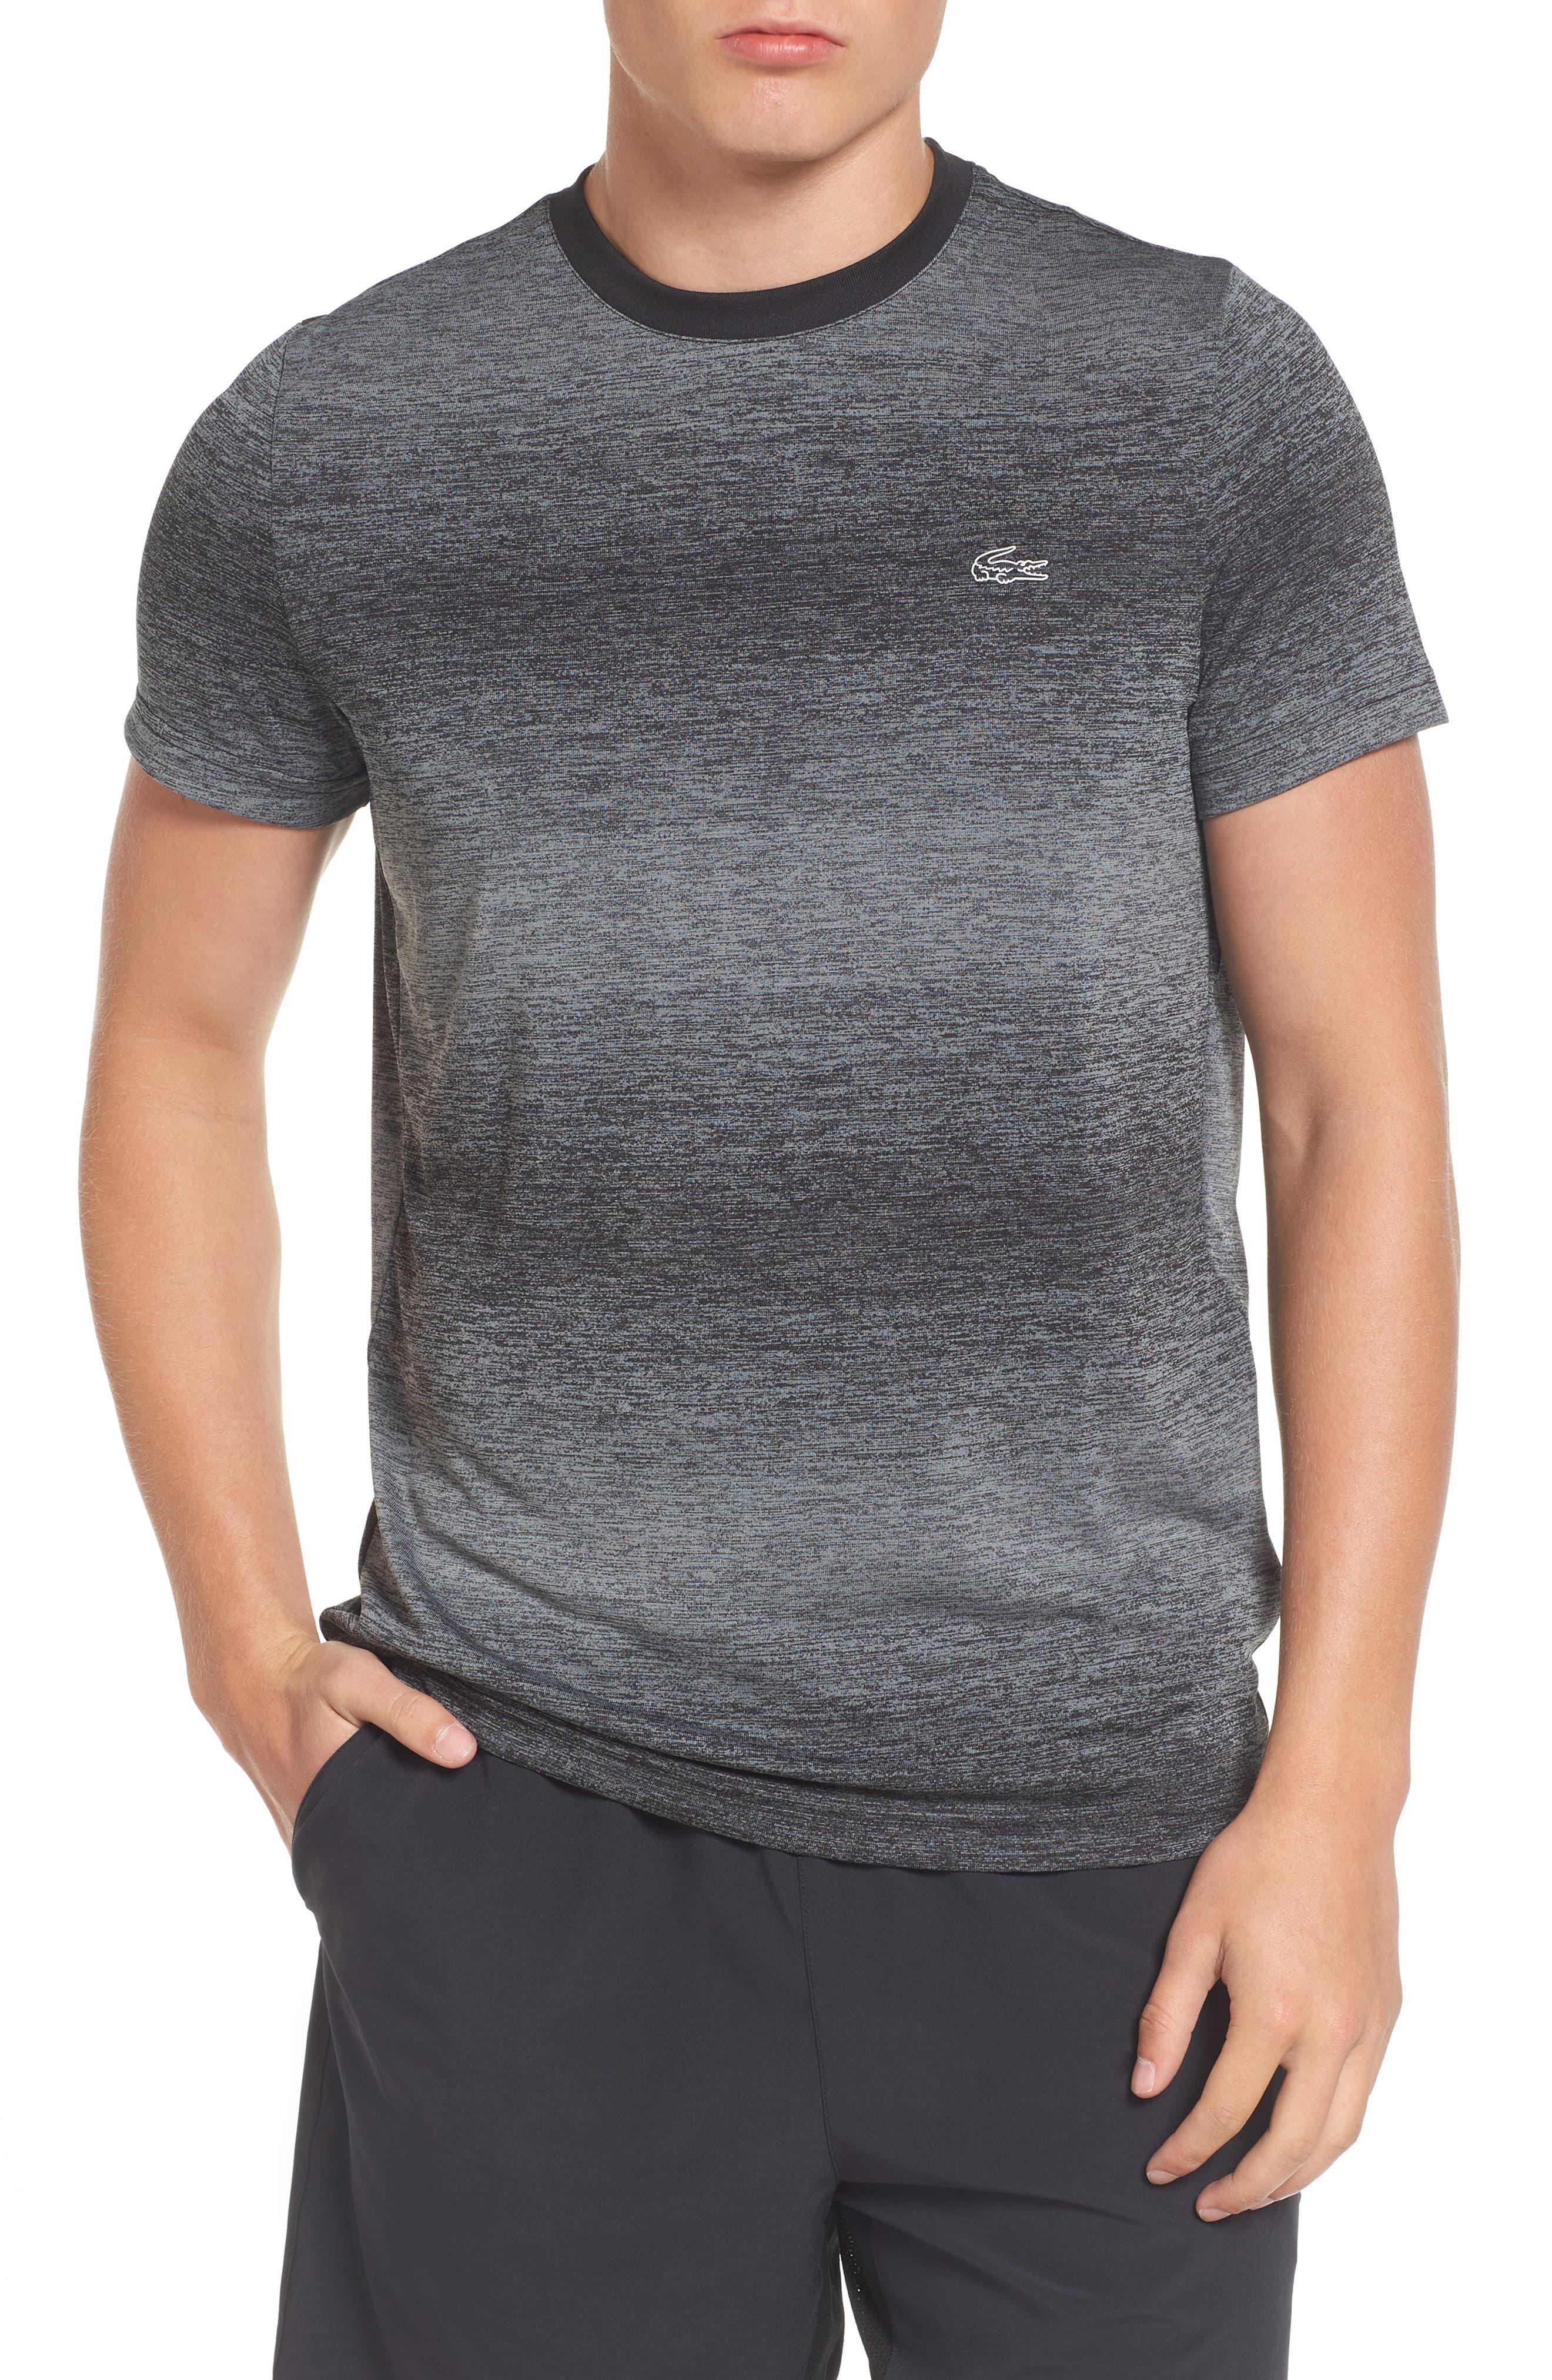 Ultra Dry Tech T-Shirt,                         Main,                         color, 007